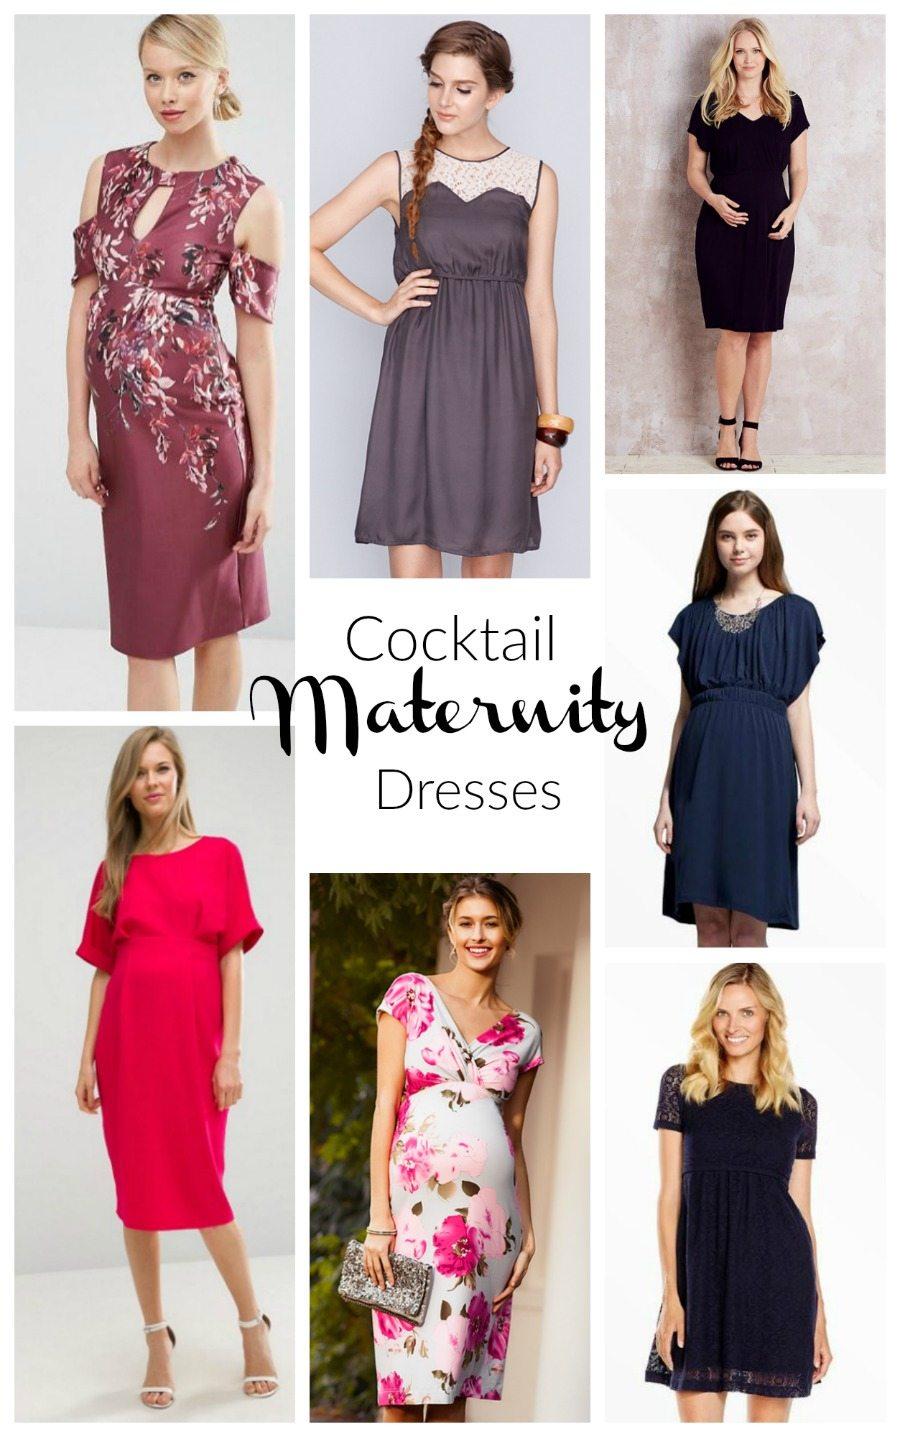 cocktail maternity dresses